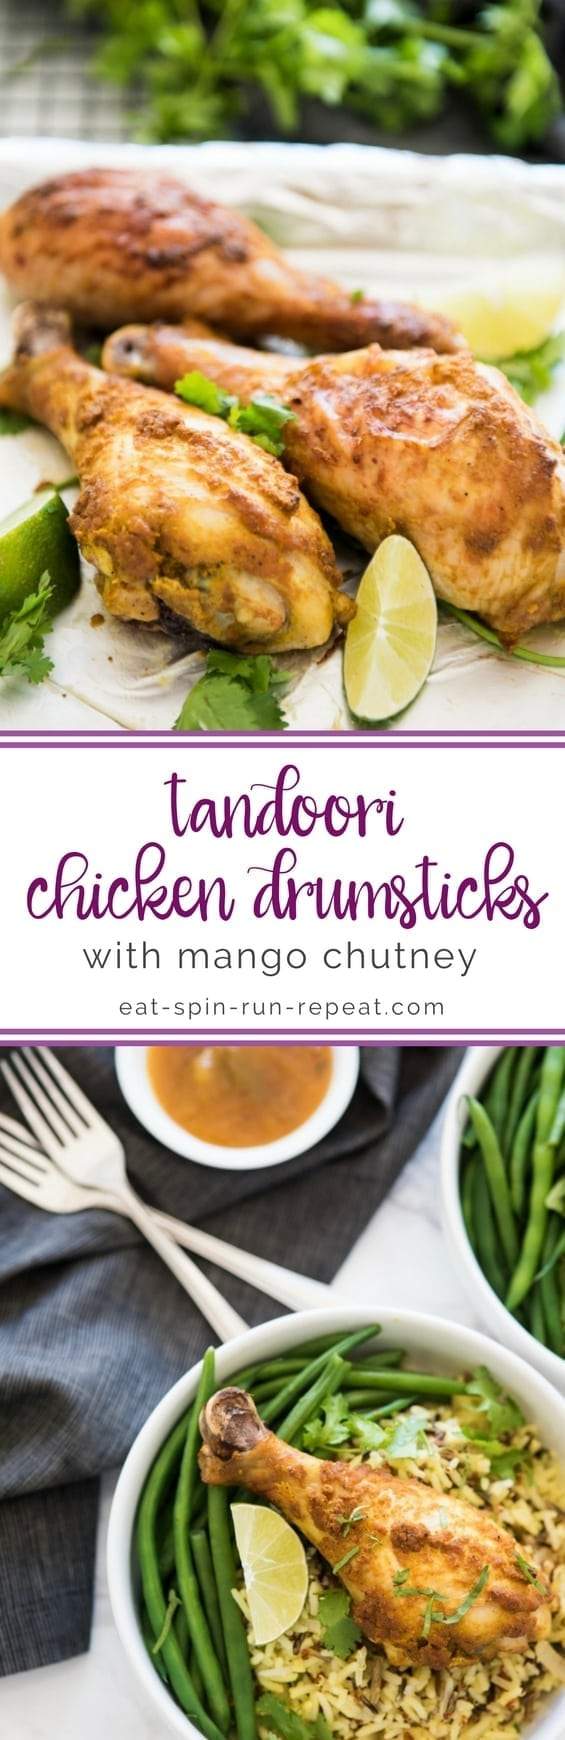 Healthy Tandoori Chicken Drumsticks with Mango Chutney || #glutenfree #paleo || Eat Spin Run Repeat